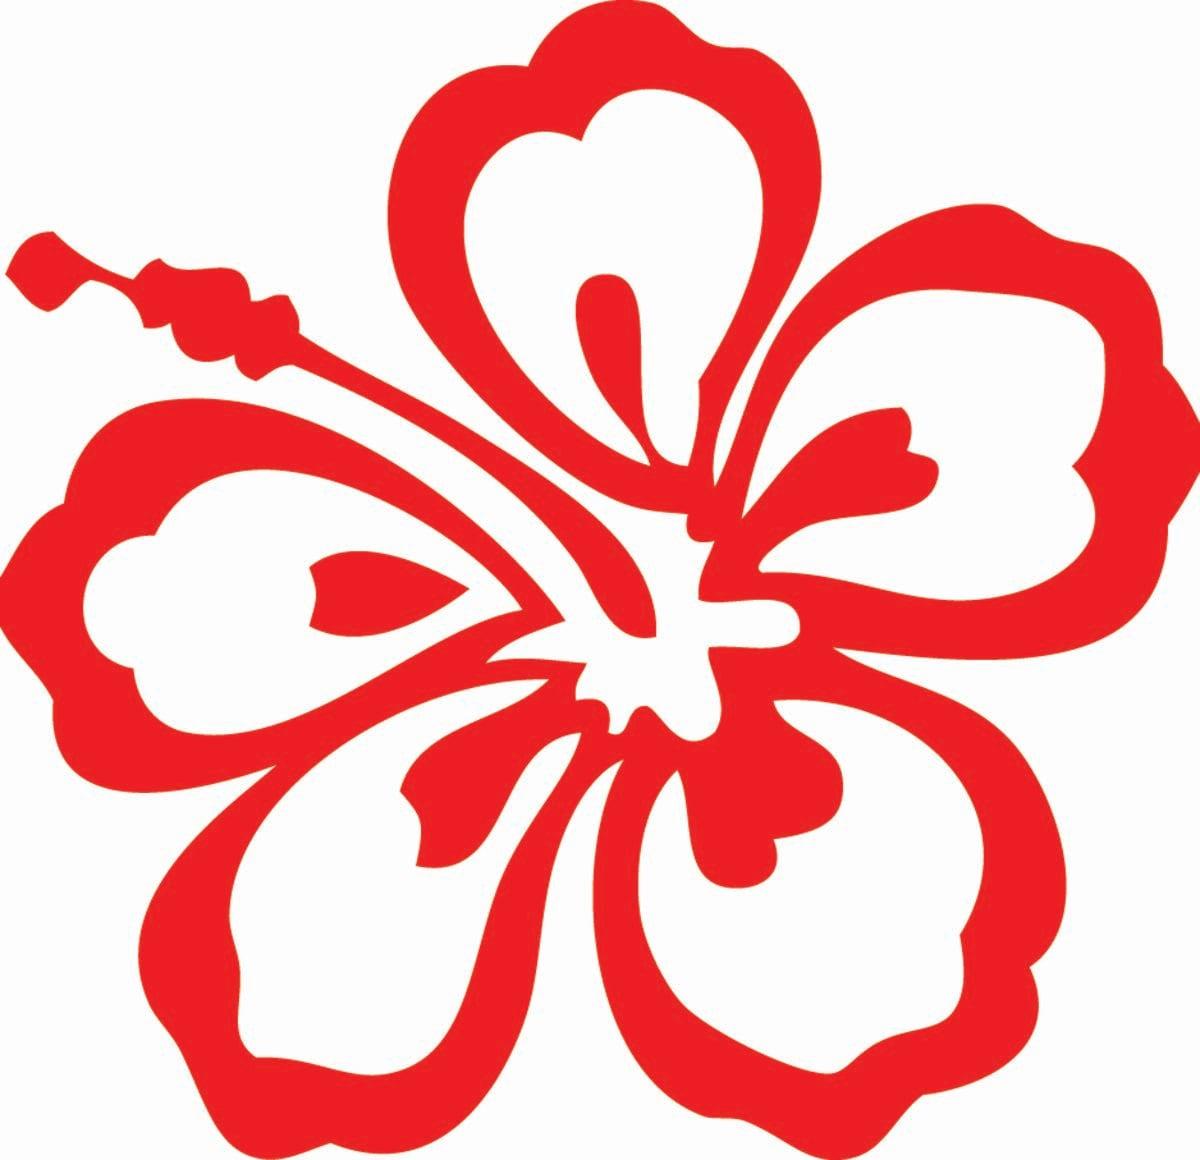 Clavel hawaiano o hibiscus rojo.